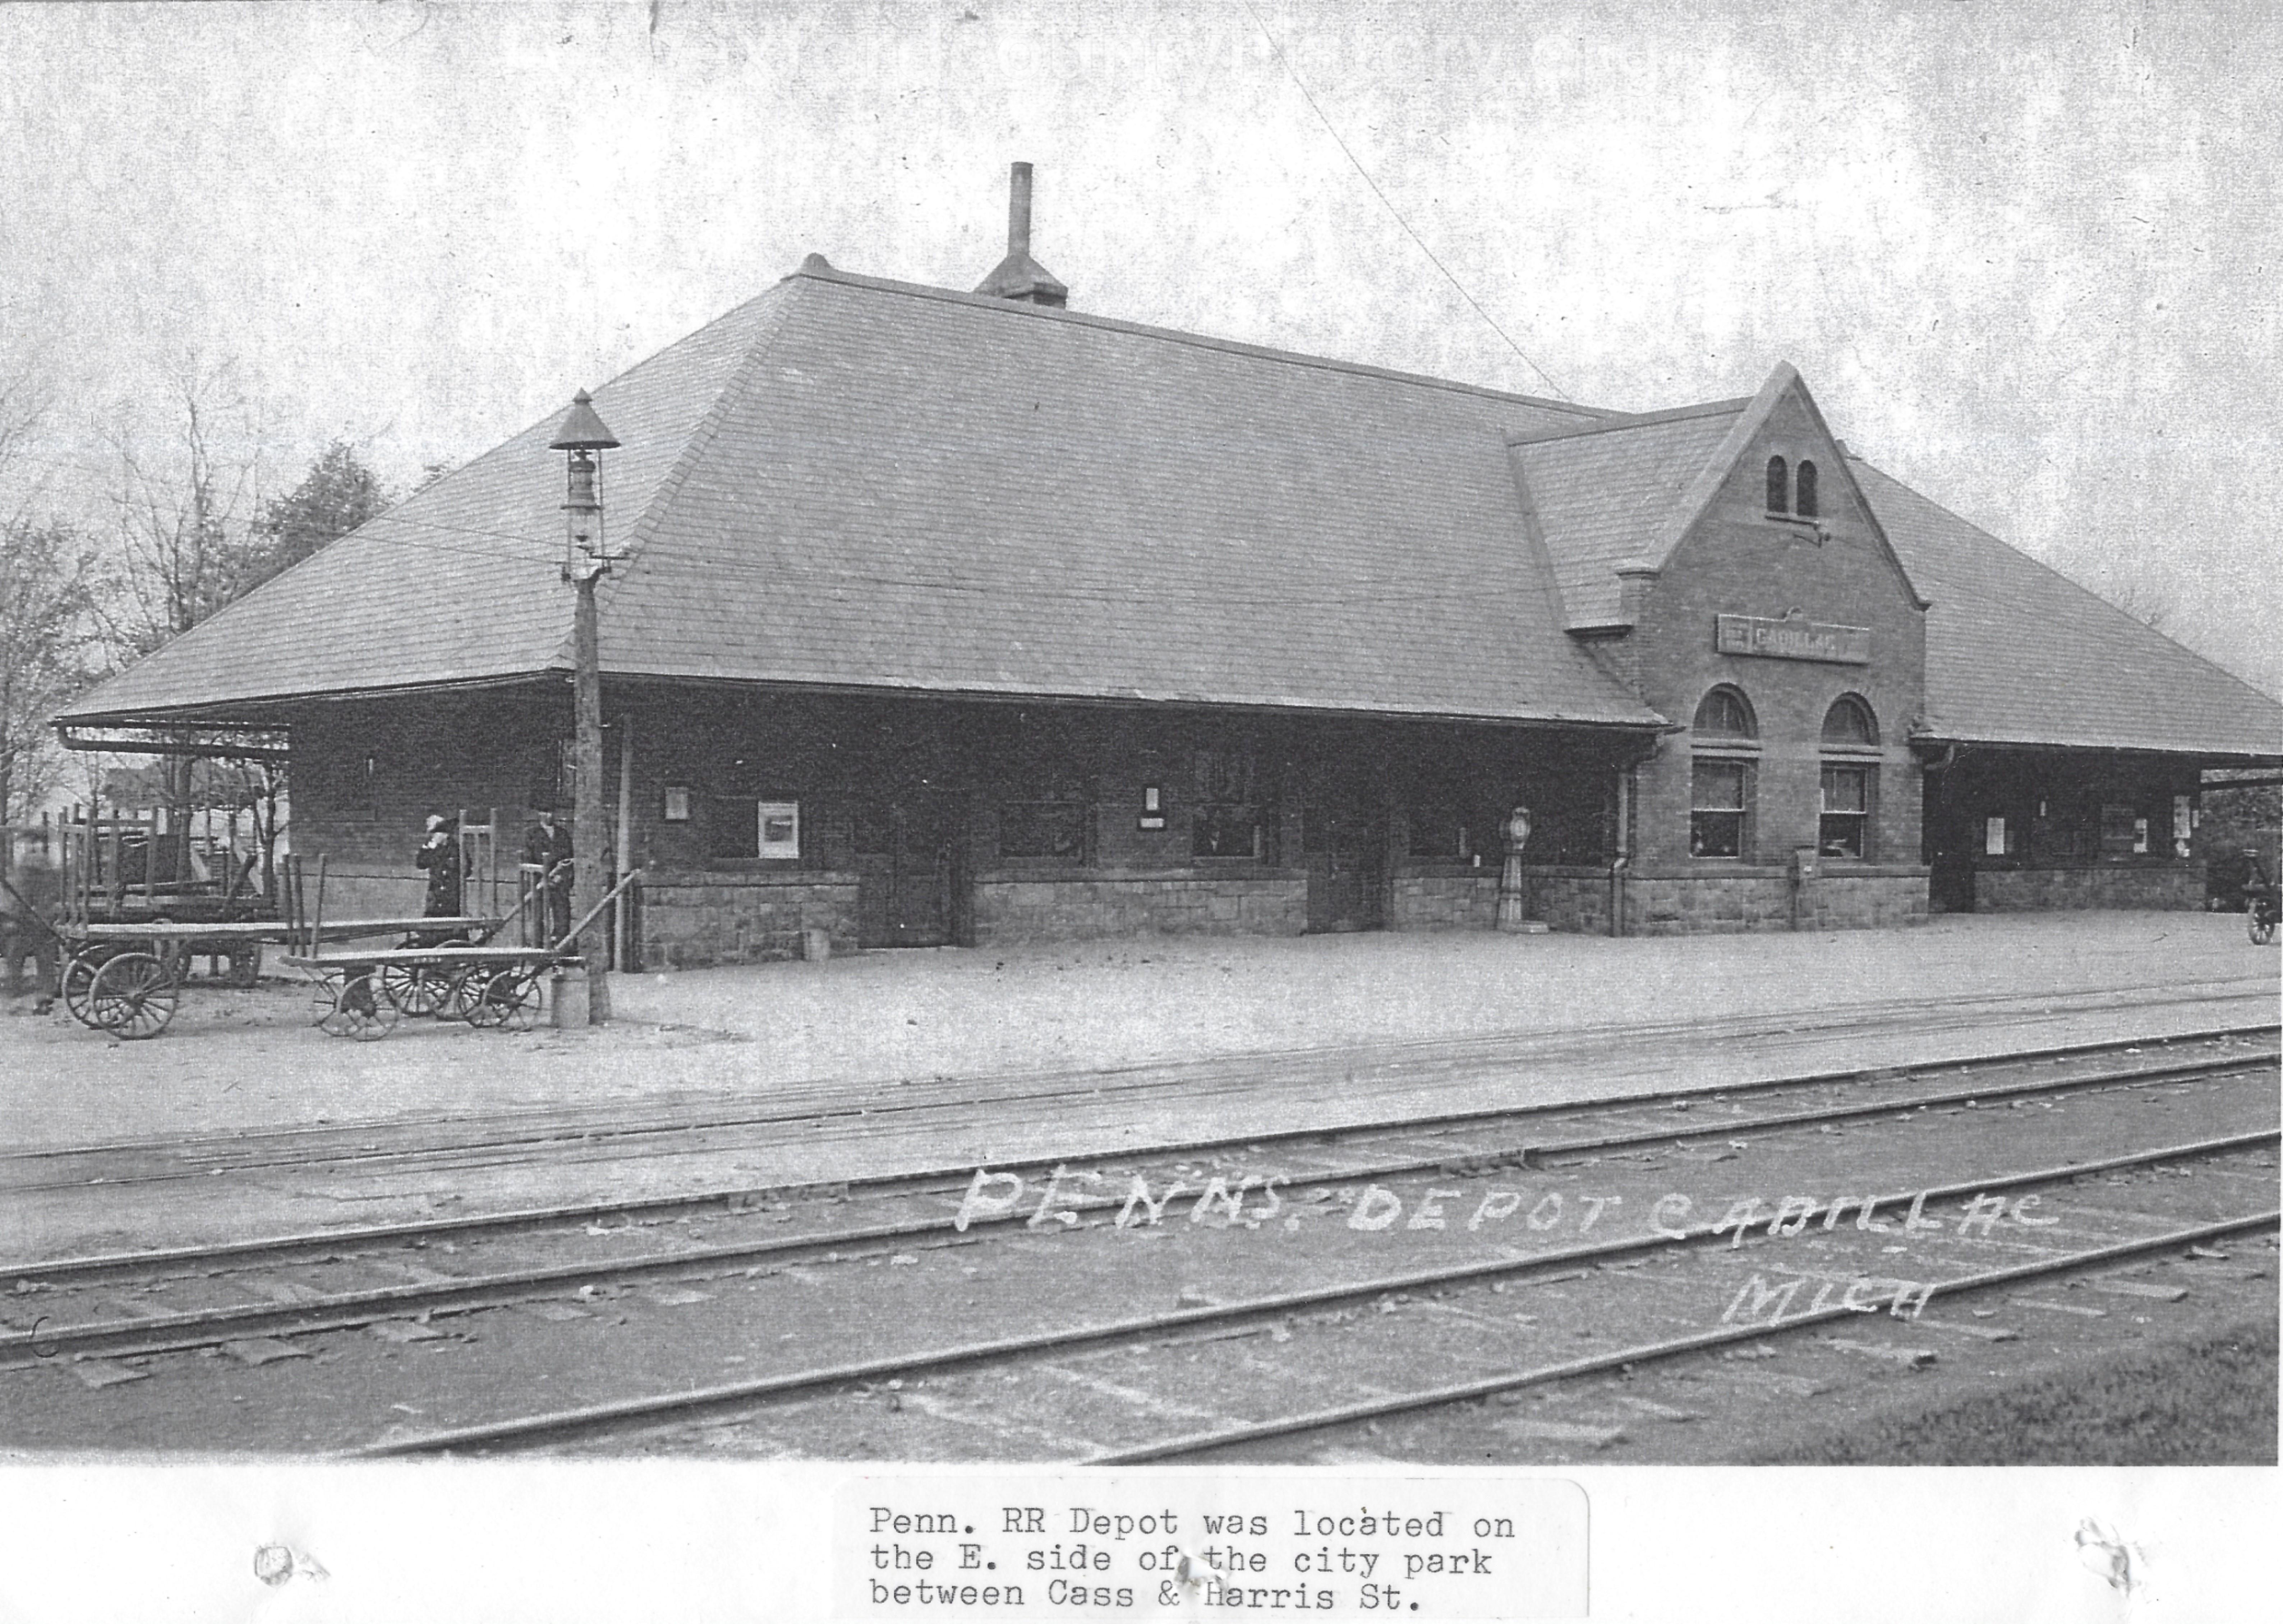 Cadillac-Railroad-Grand-Rapids-And-Indiana-Railroad-Depot-Pennsylvania-Railroad-Depot-43